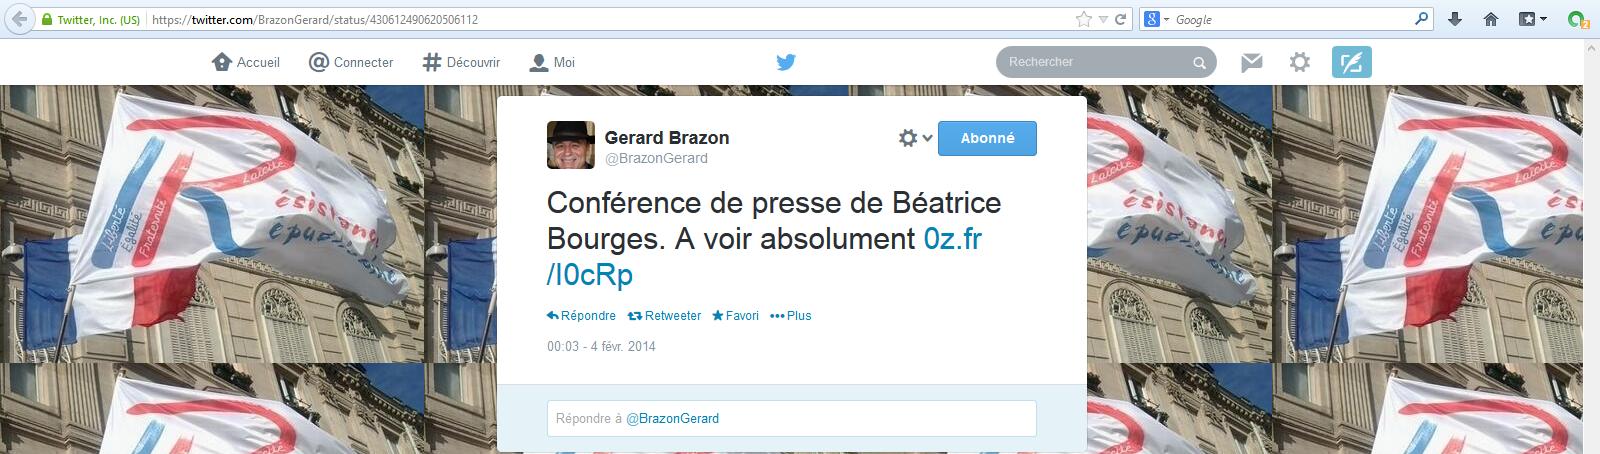 Gerard-Brazon-Beatrice-Bourges